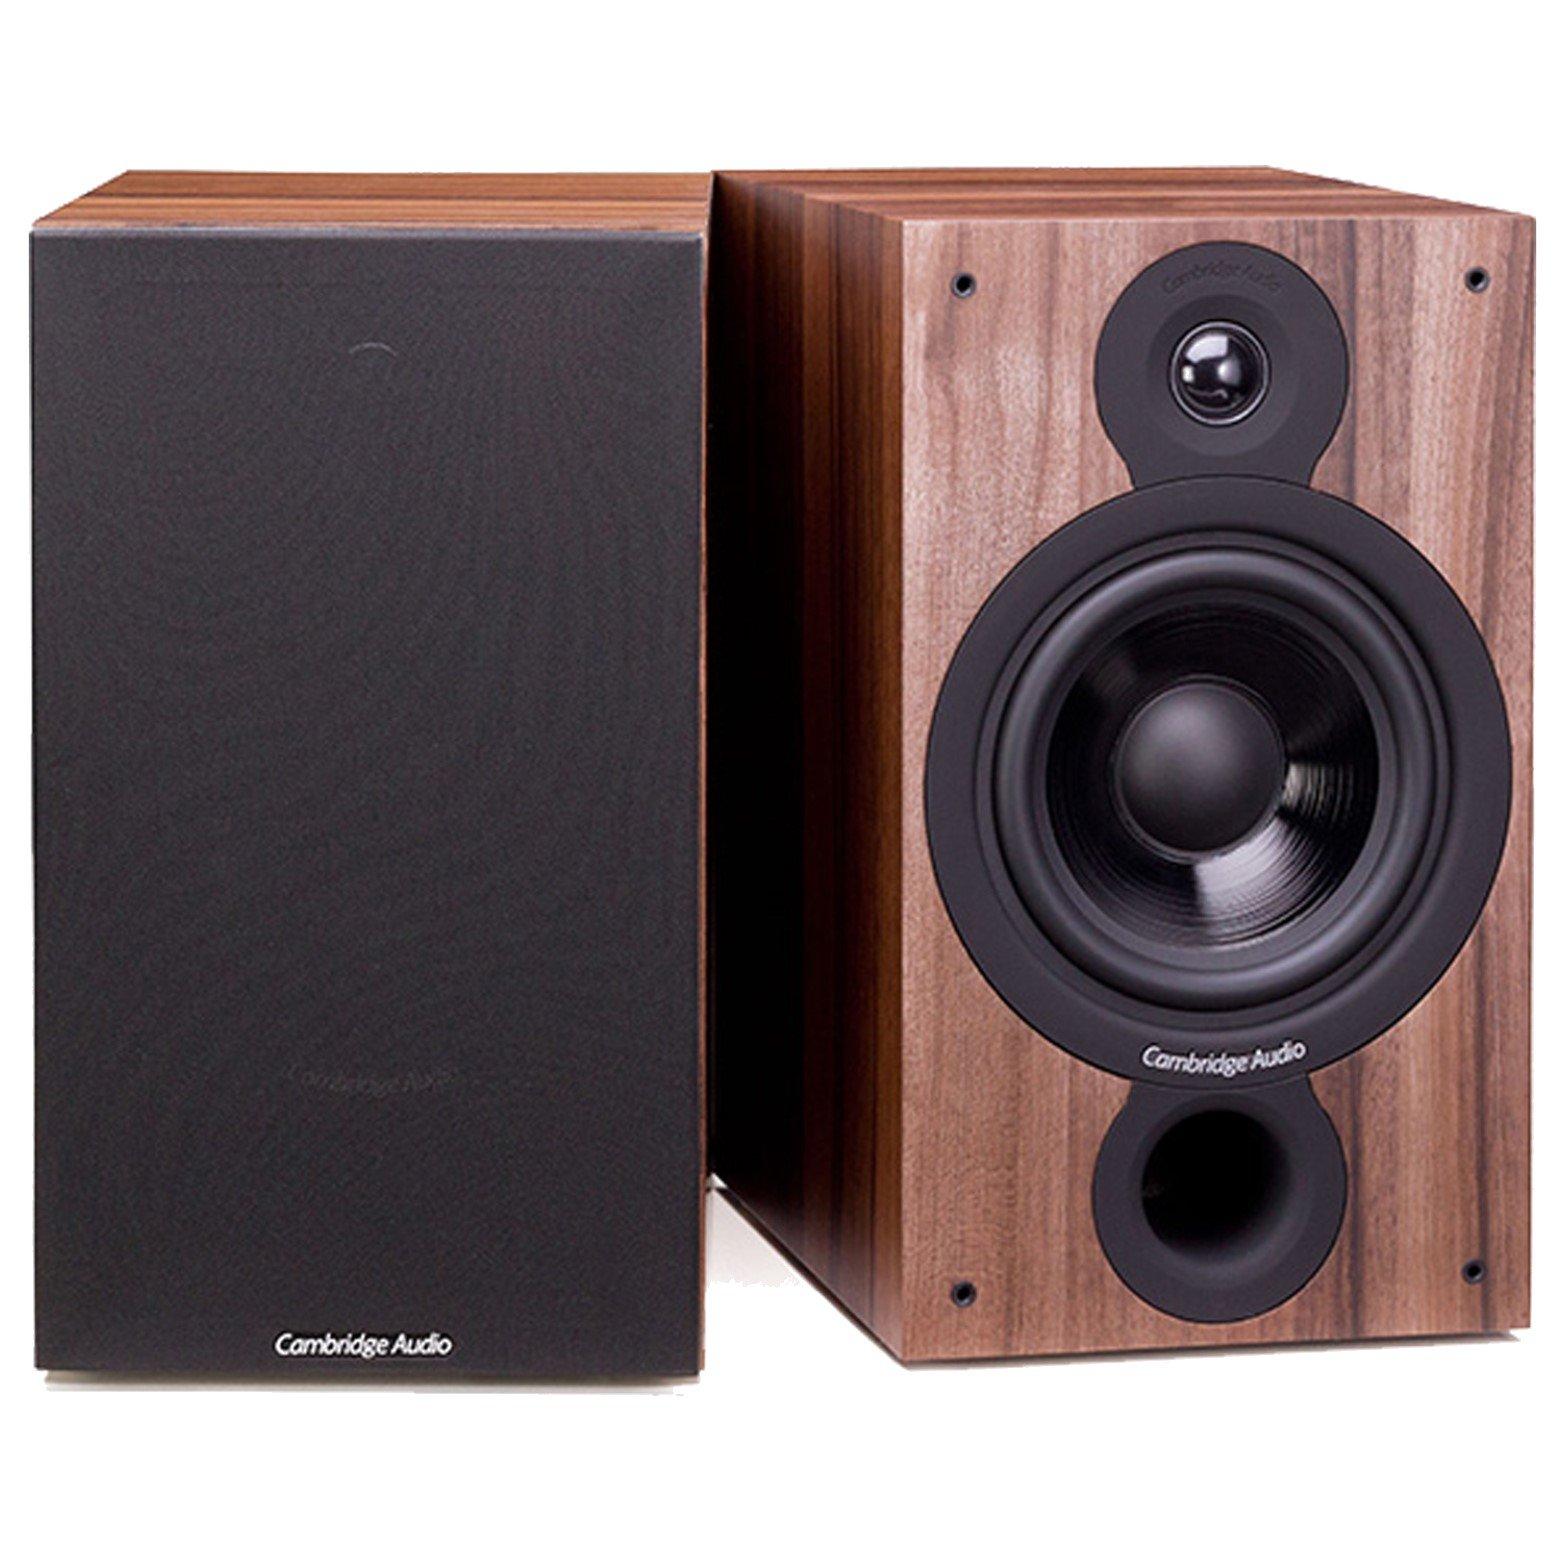 Cambridge Audio SX 60 Speakers Walnut